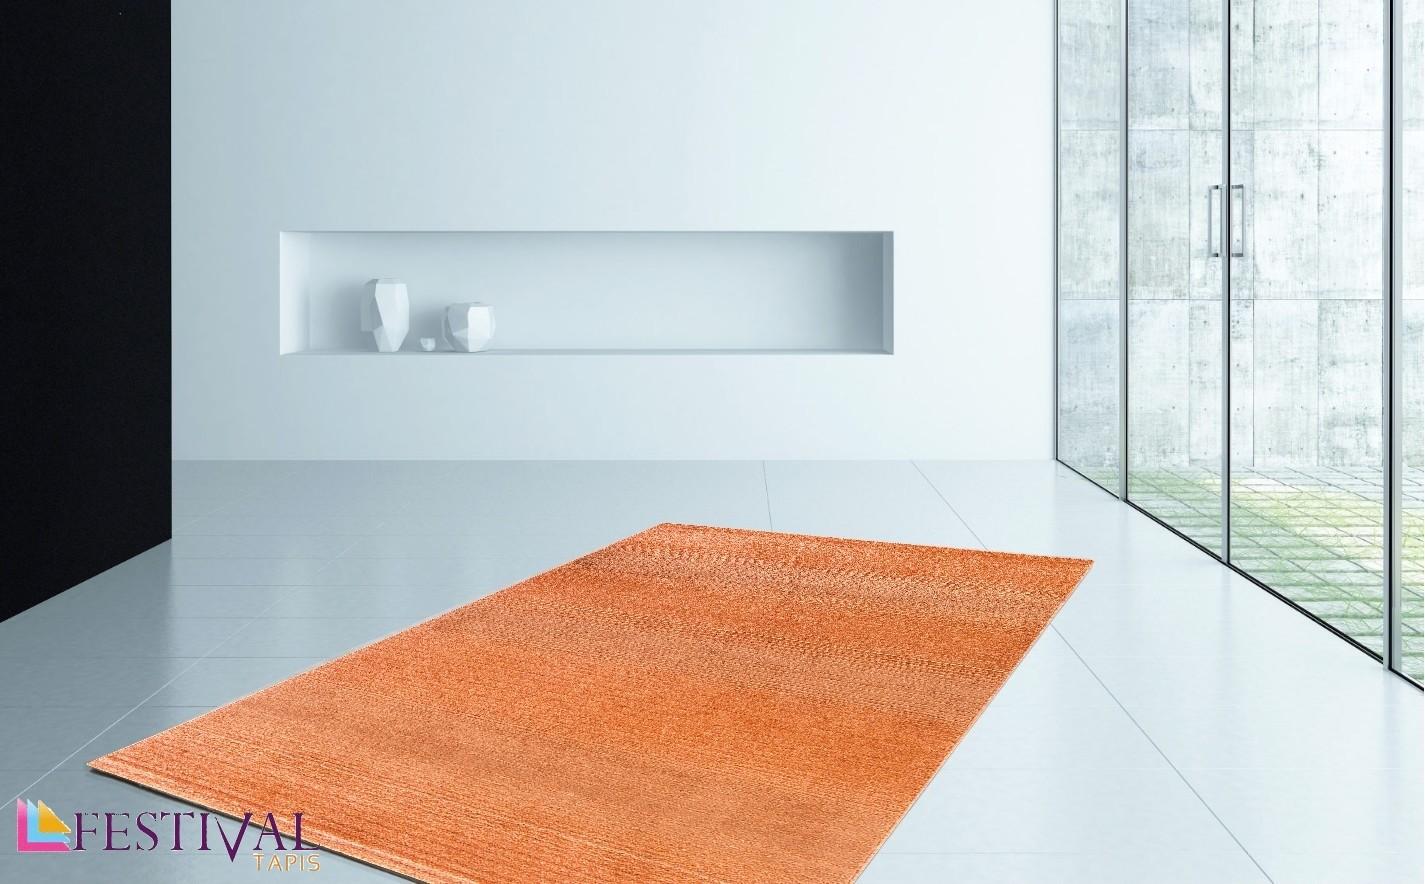 tapis uni orange longues m ches grande salon d 39 entr e. Black Bedroom Furniture Sets. Home Design Ideas